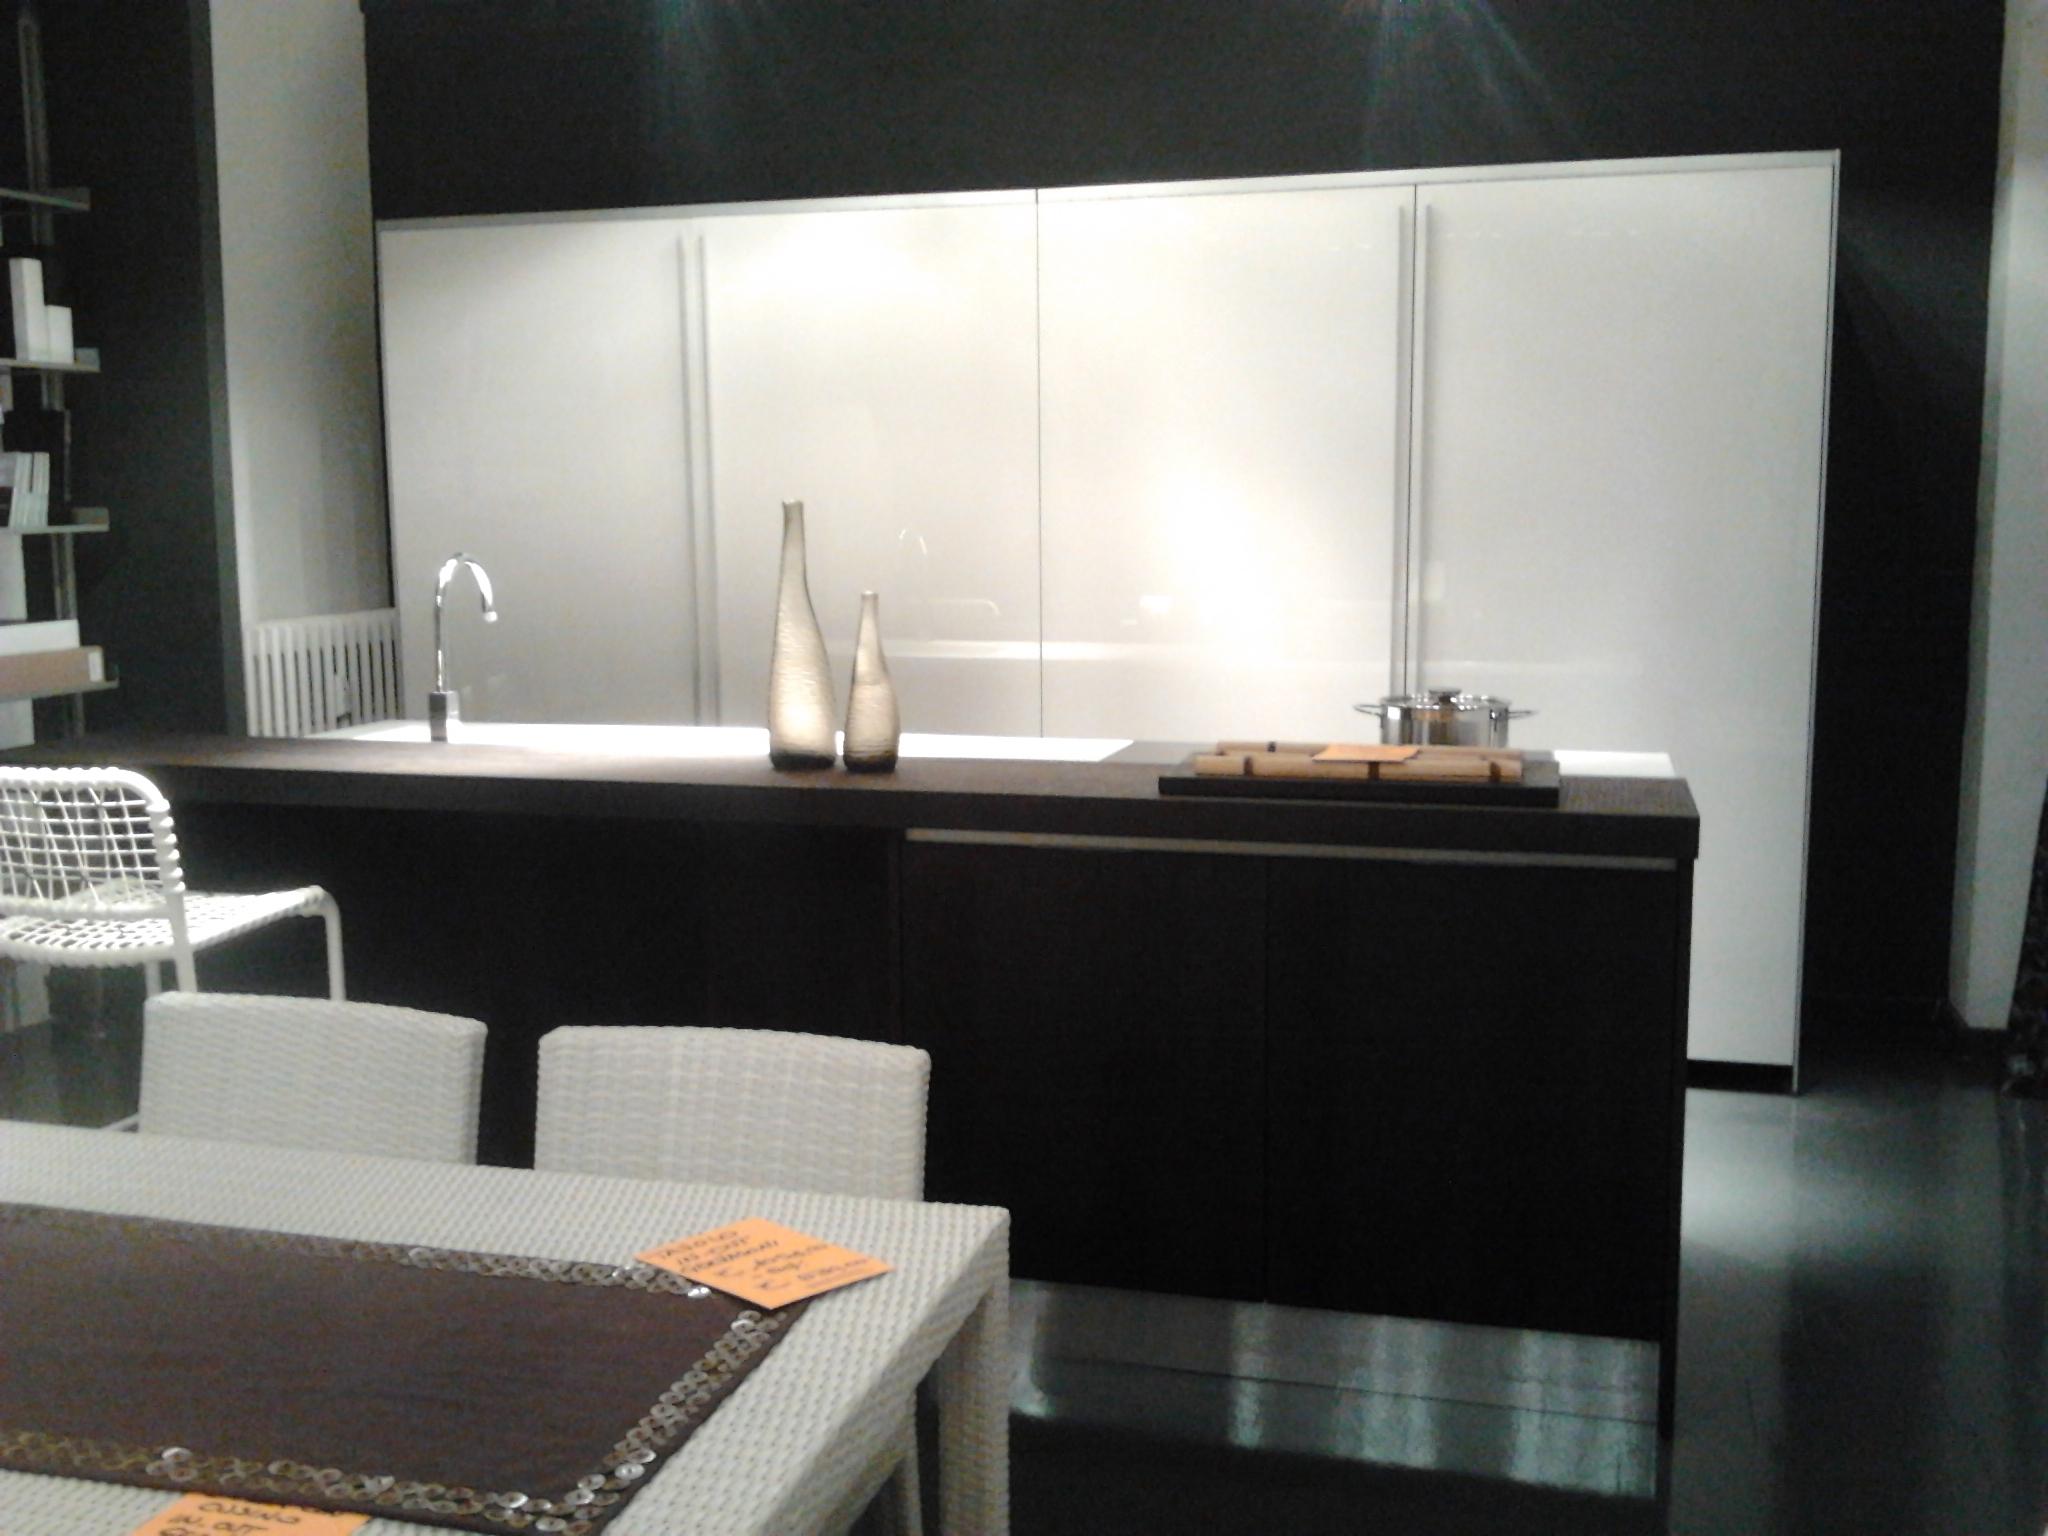 ARMADIO VALCUCINE IN OFFERTA Cucine A Prezzi Scontati #81654A 2048 1536 Veneta Cucine O Valcucine